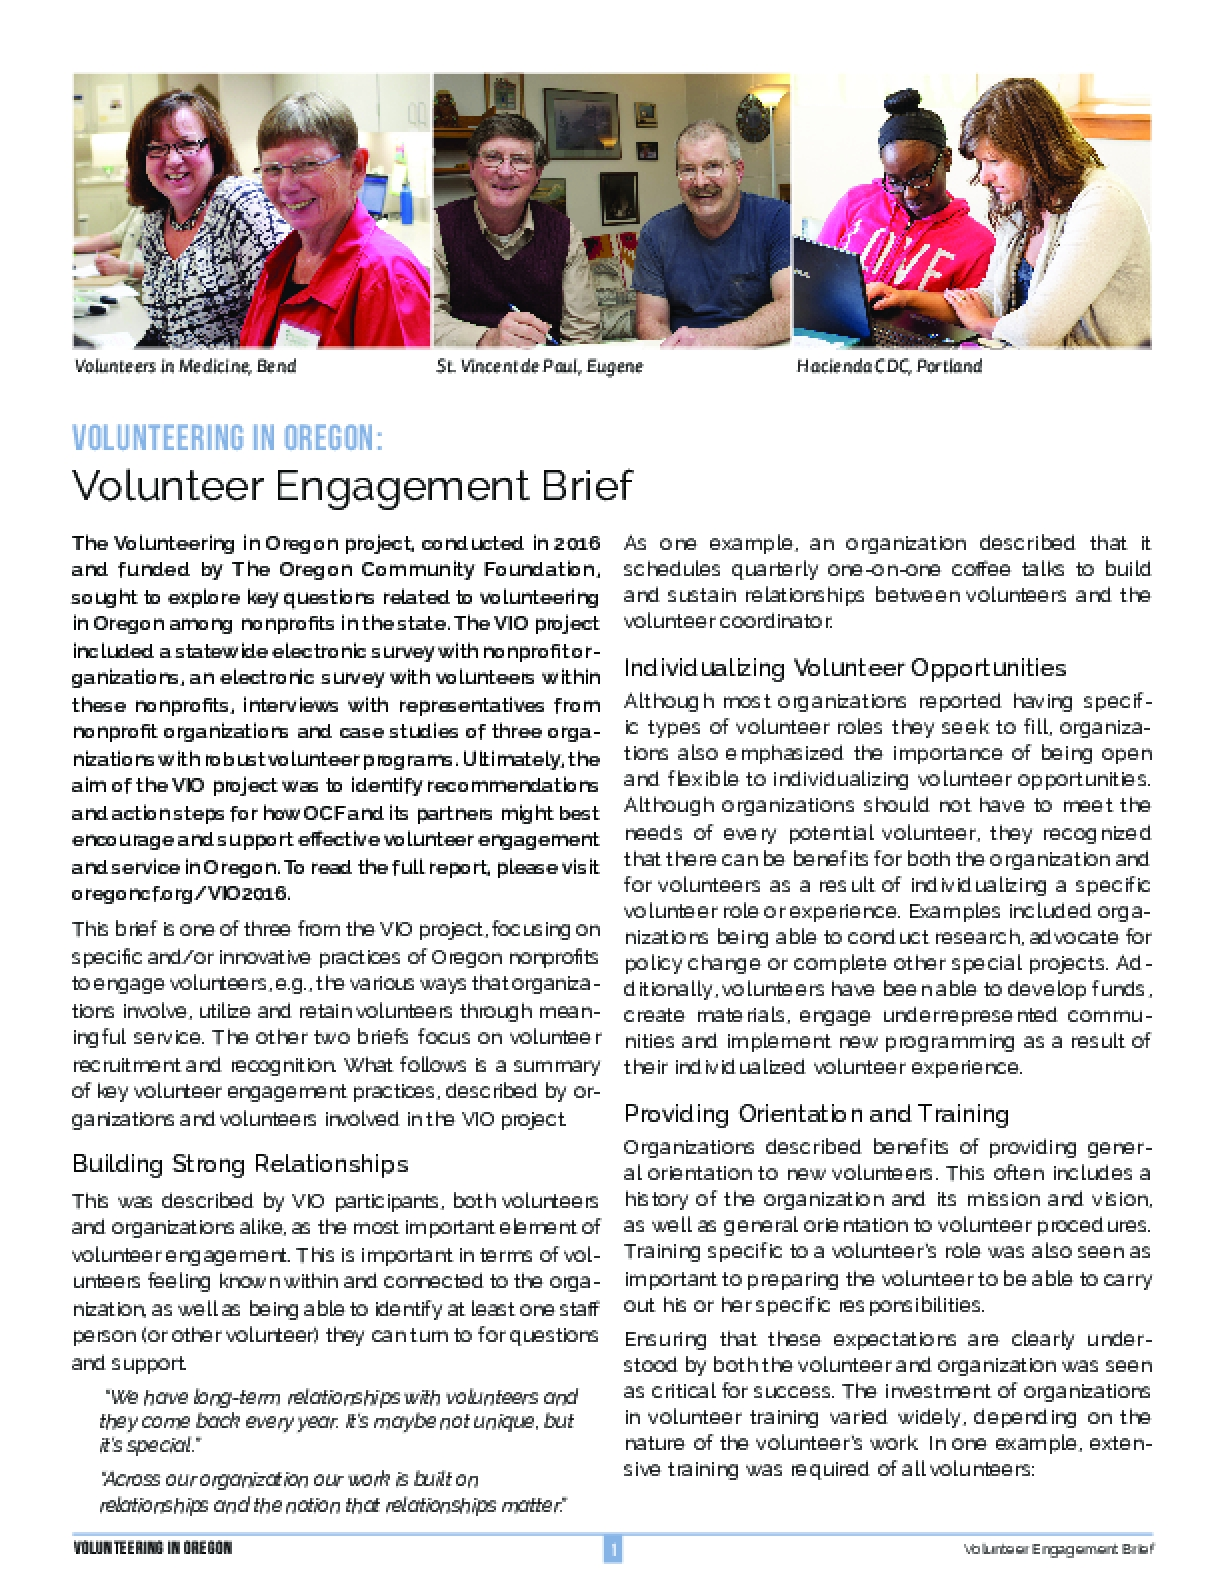 Volunteering in Oregon: Volunteer Engagement Brief